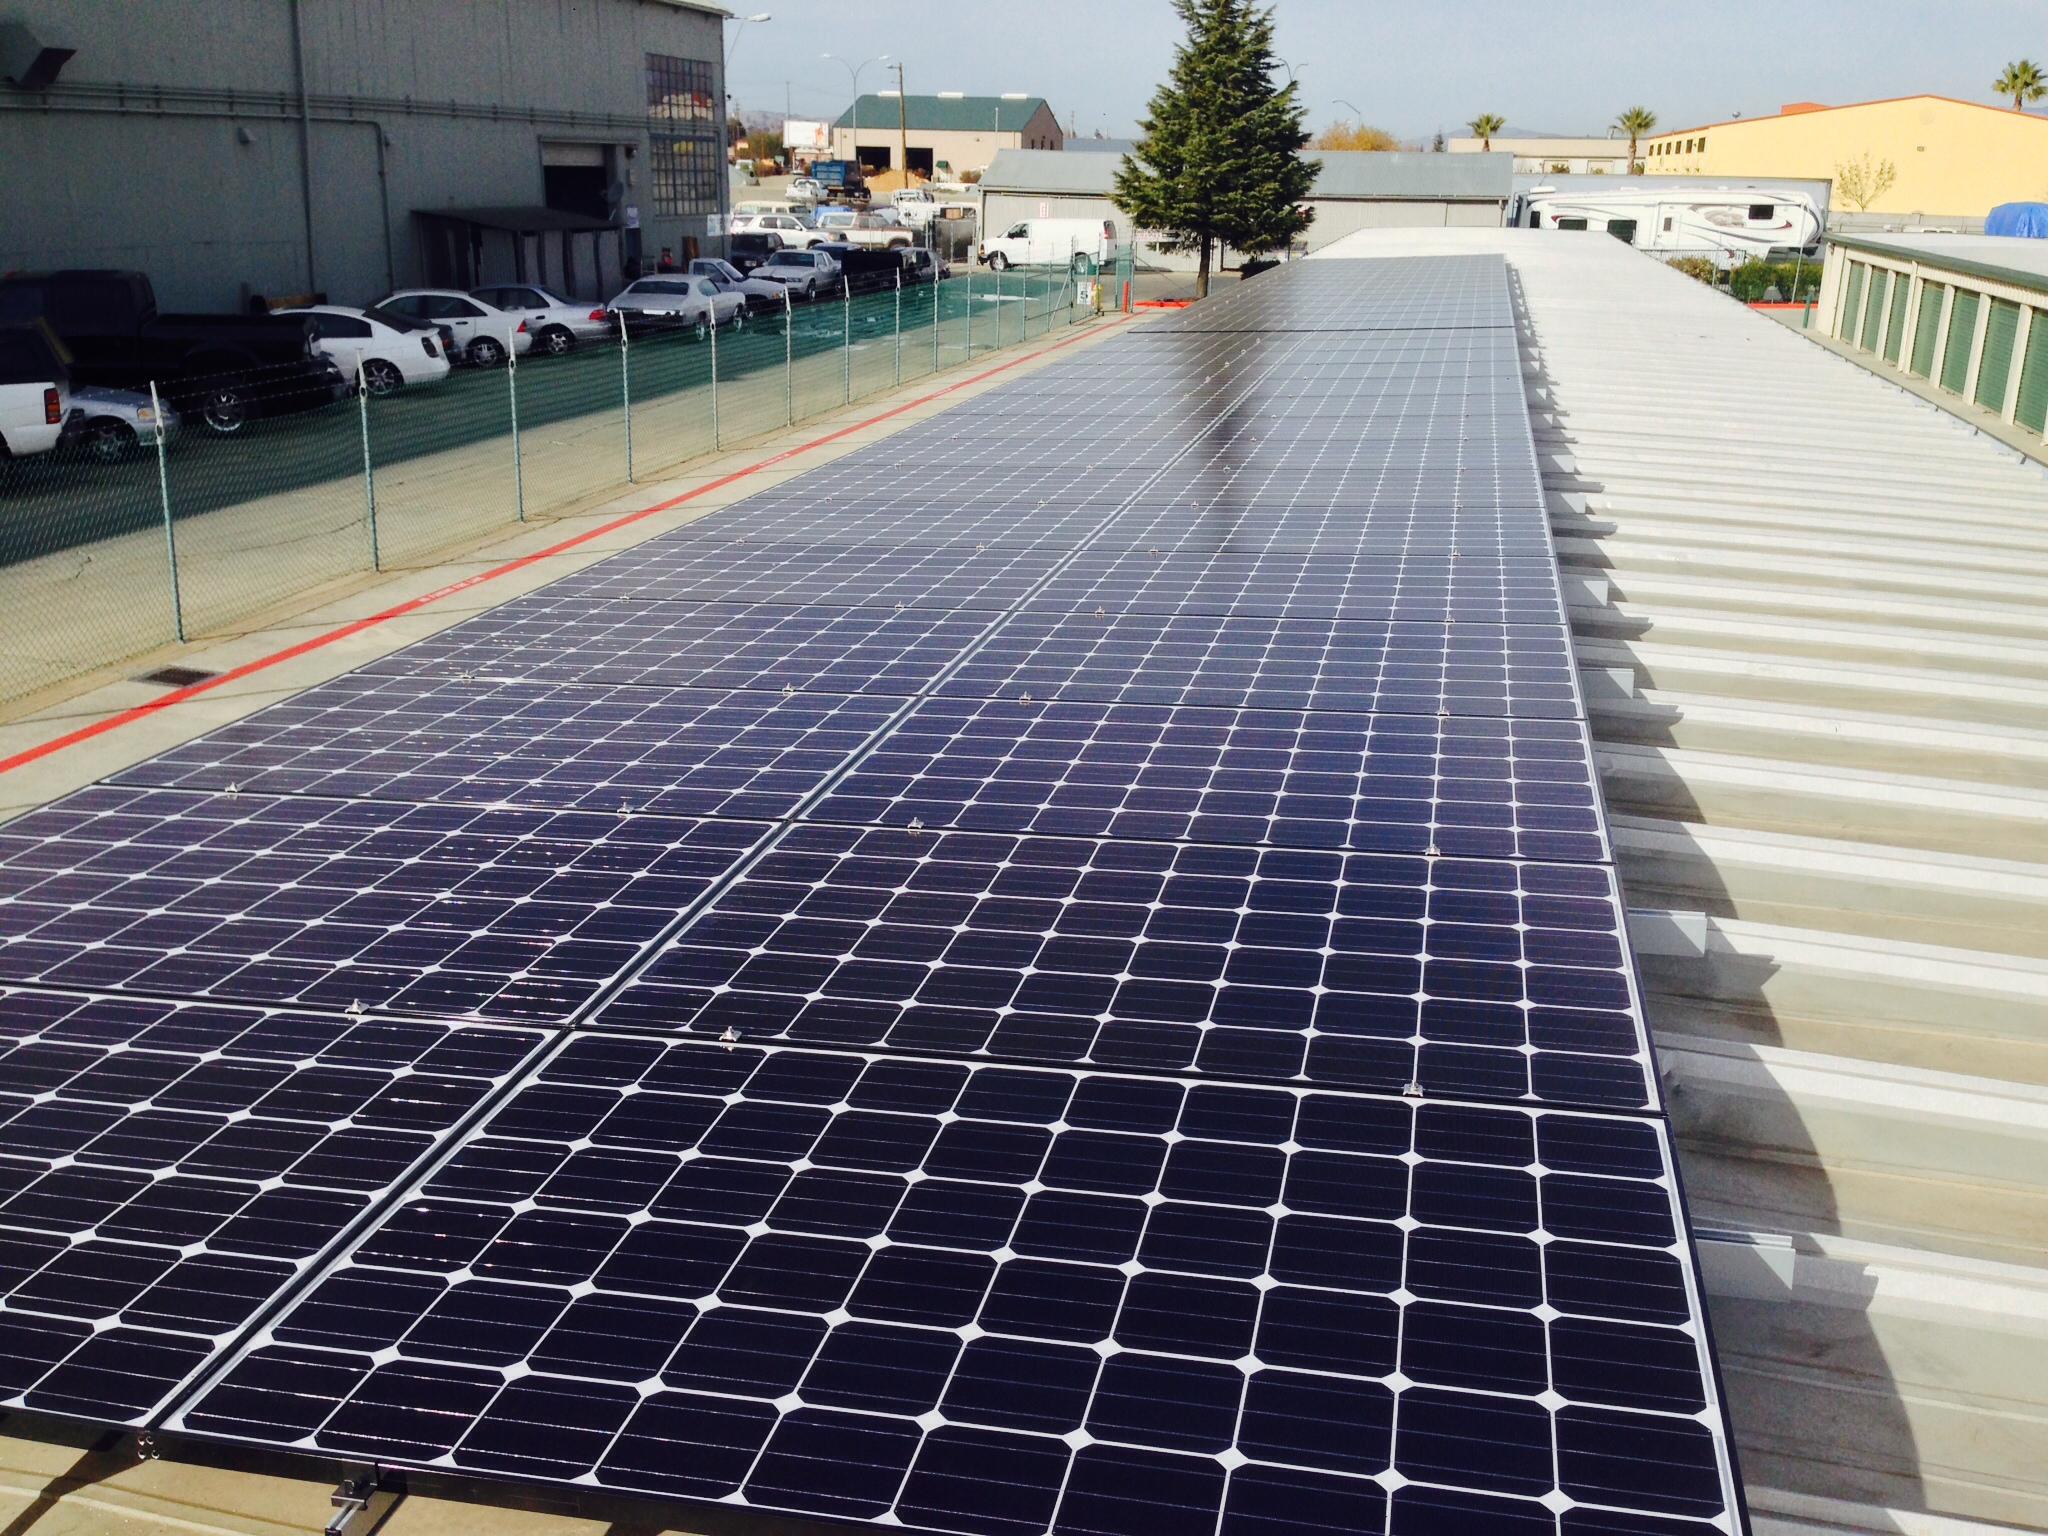 Commercial_Solar_PV